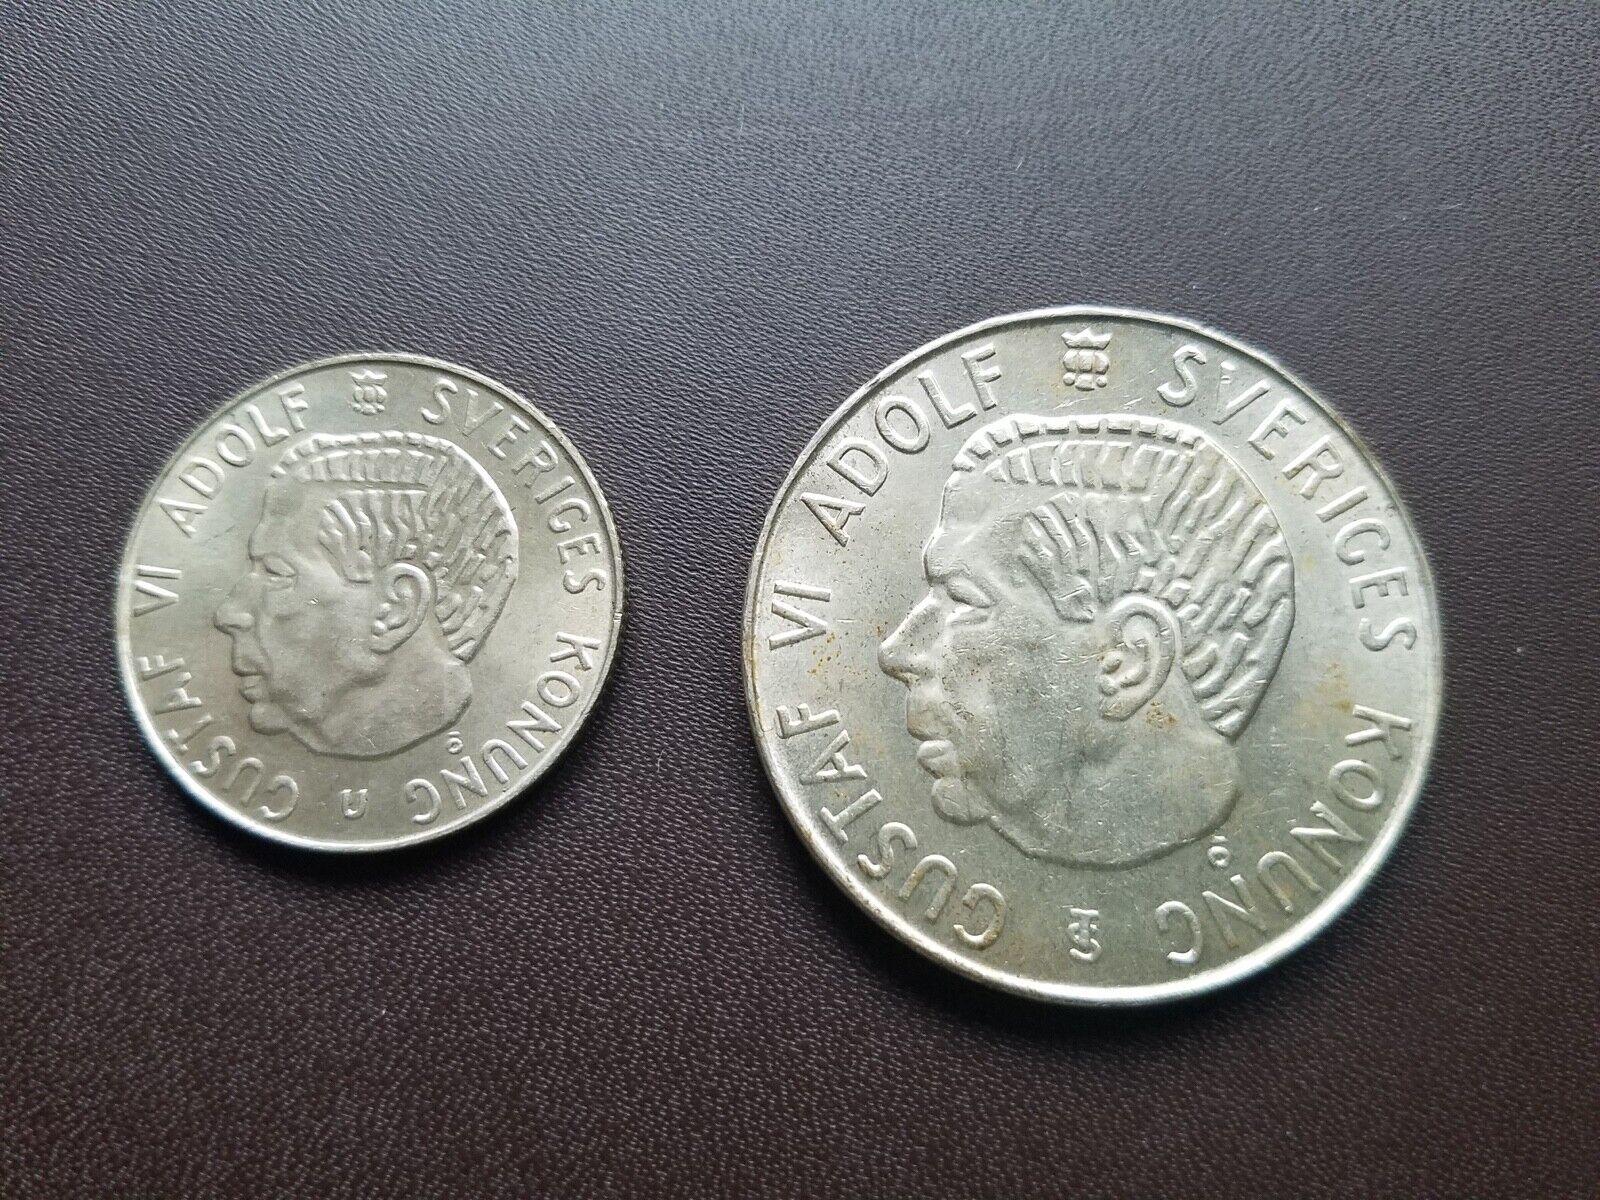 Sweden, Design Pair 1964 Krona 1954 5 Kronor. Gustav VI Adolf.  - $4.95